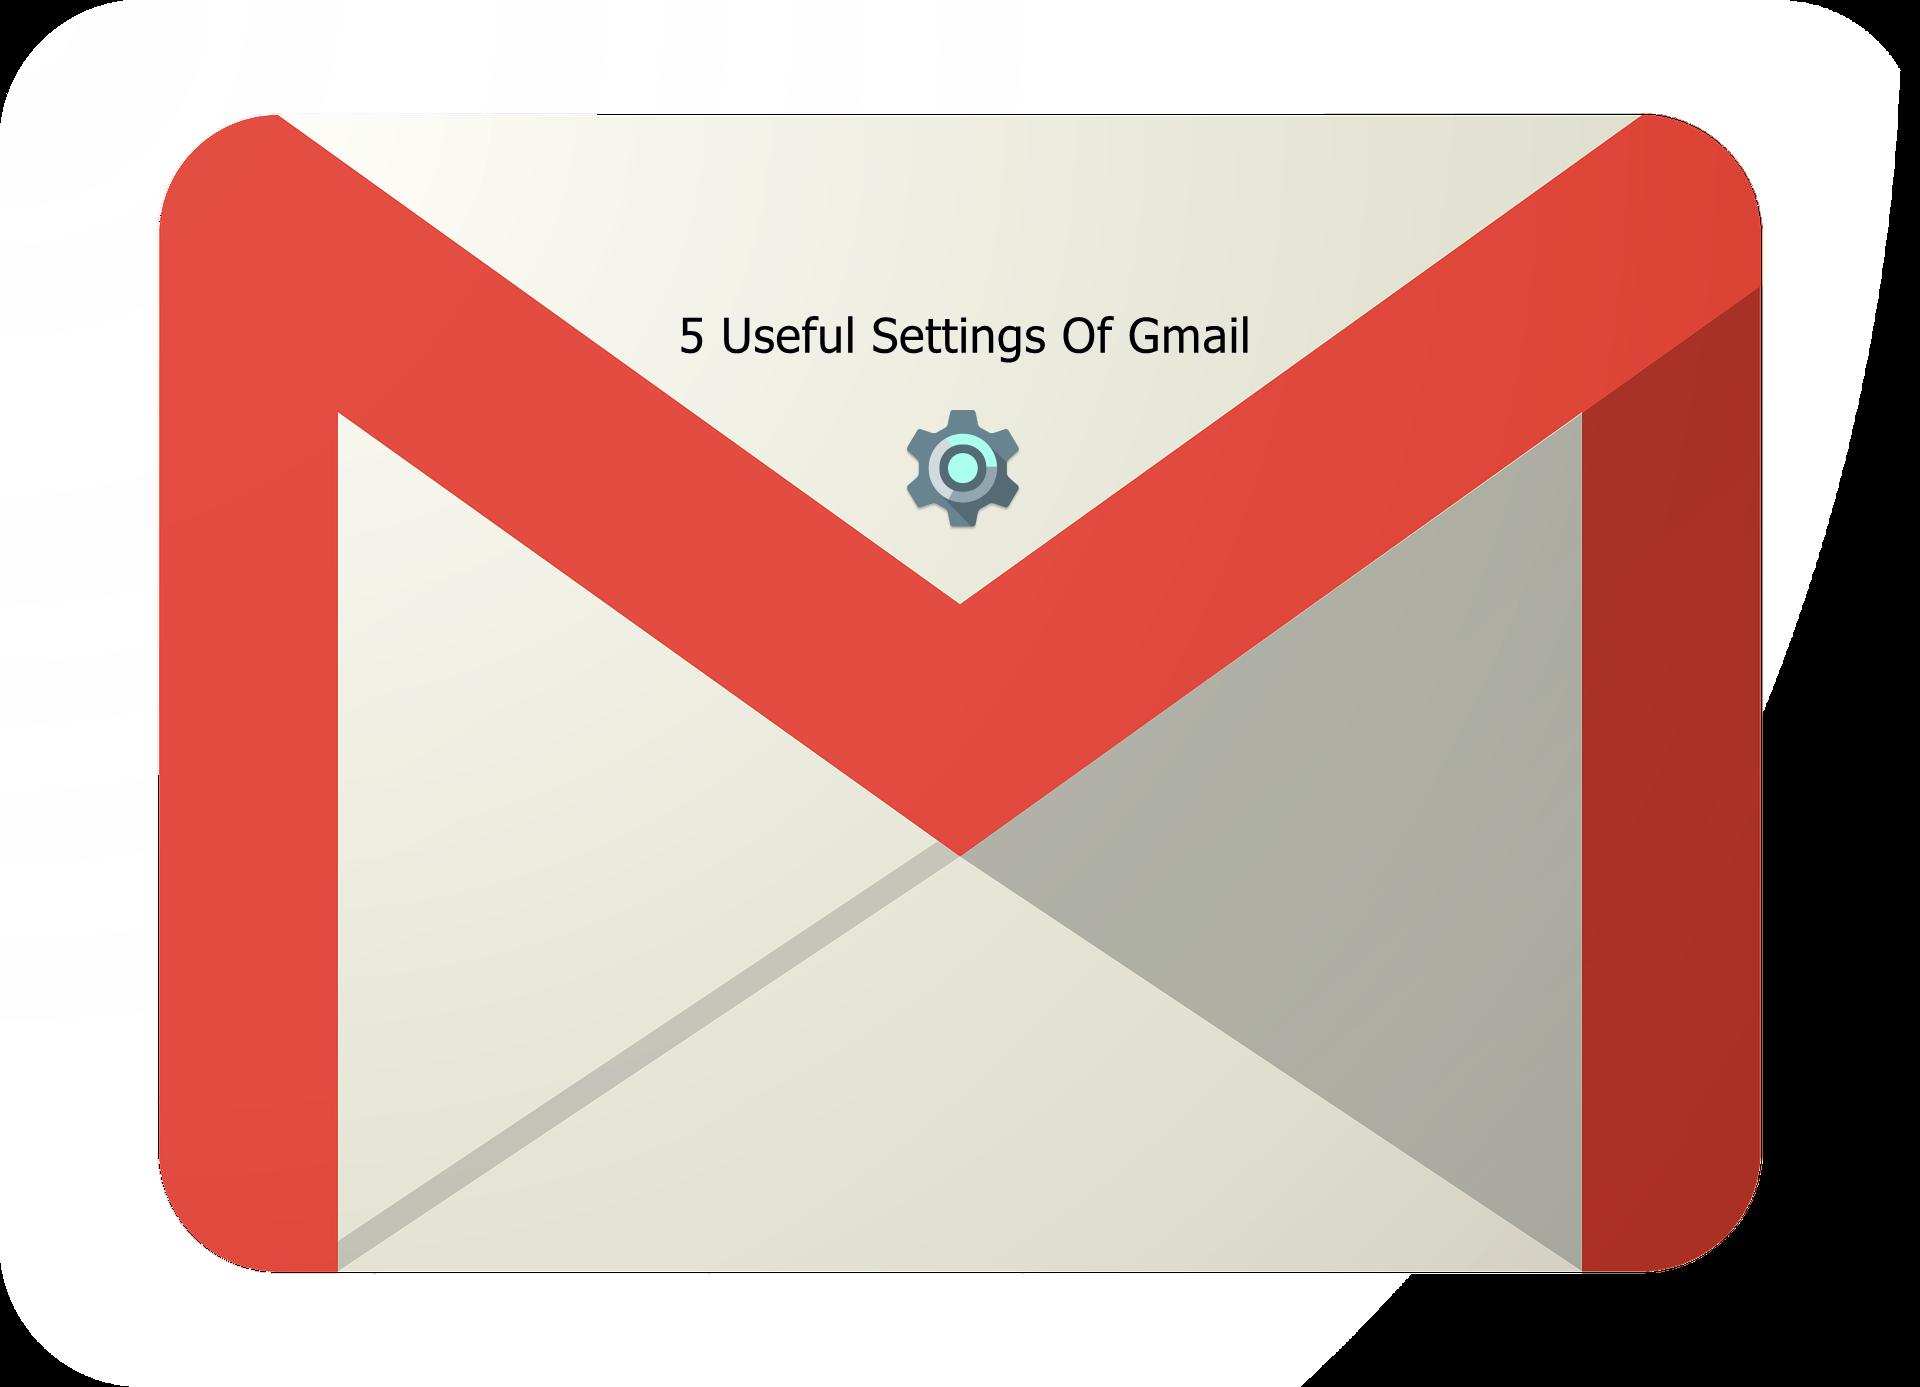 Five Useful Settings Of Gmail